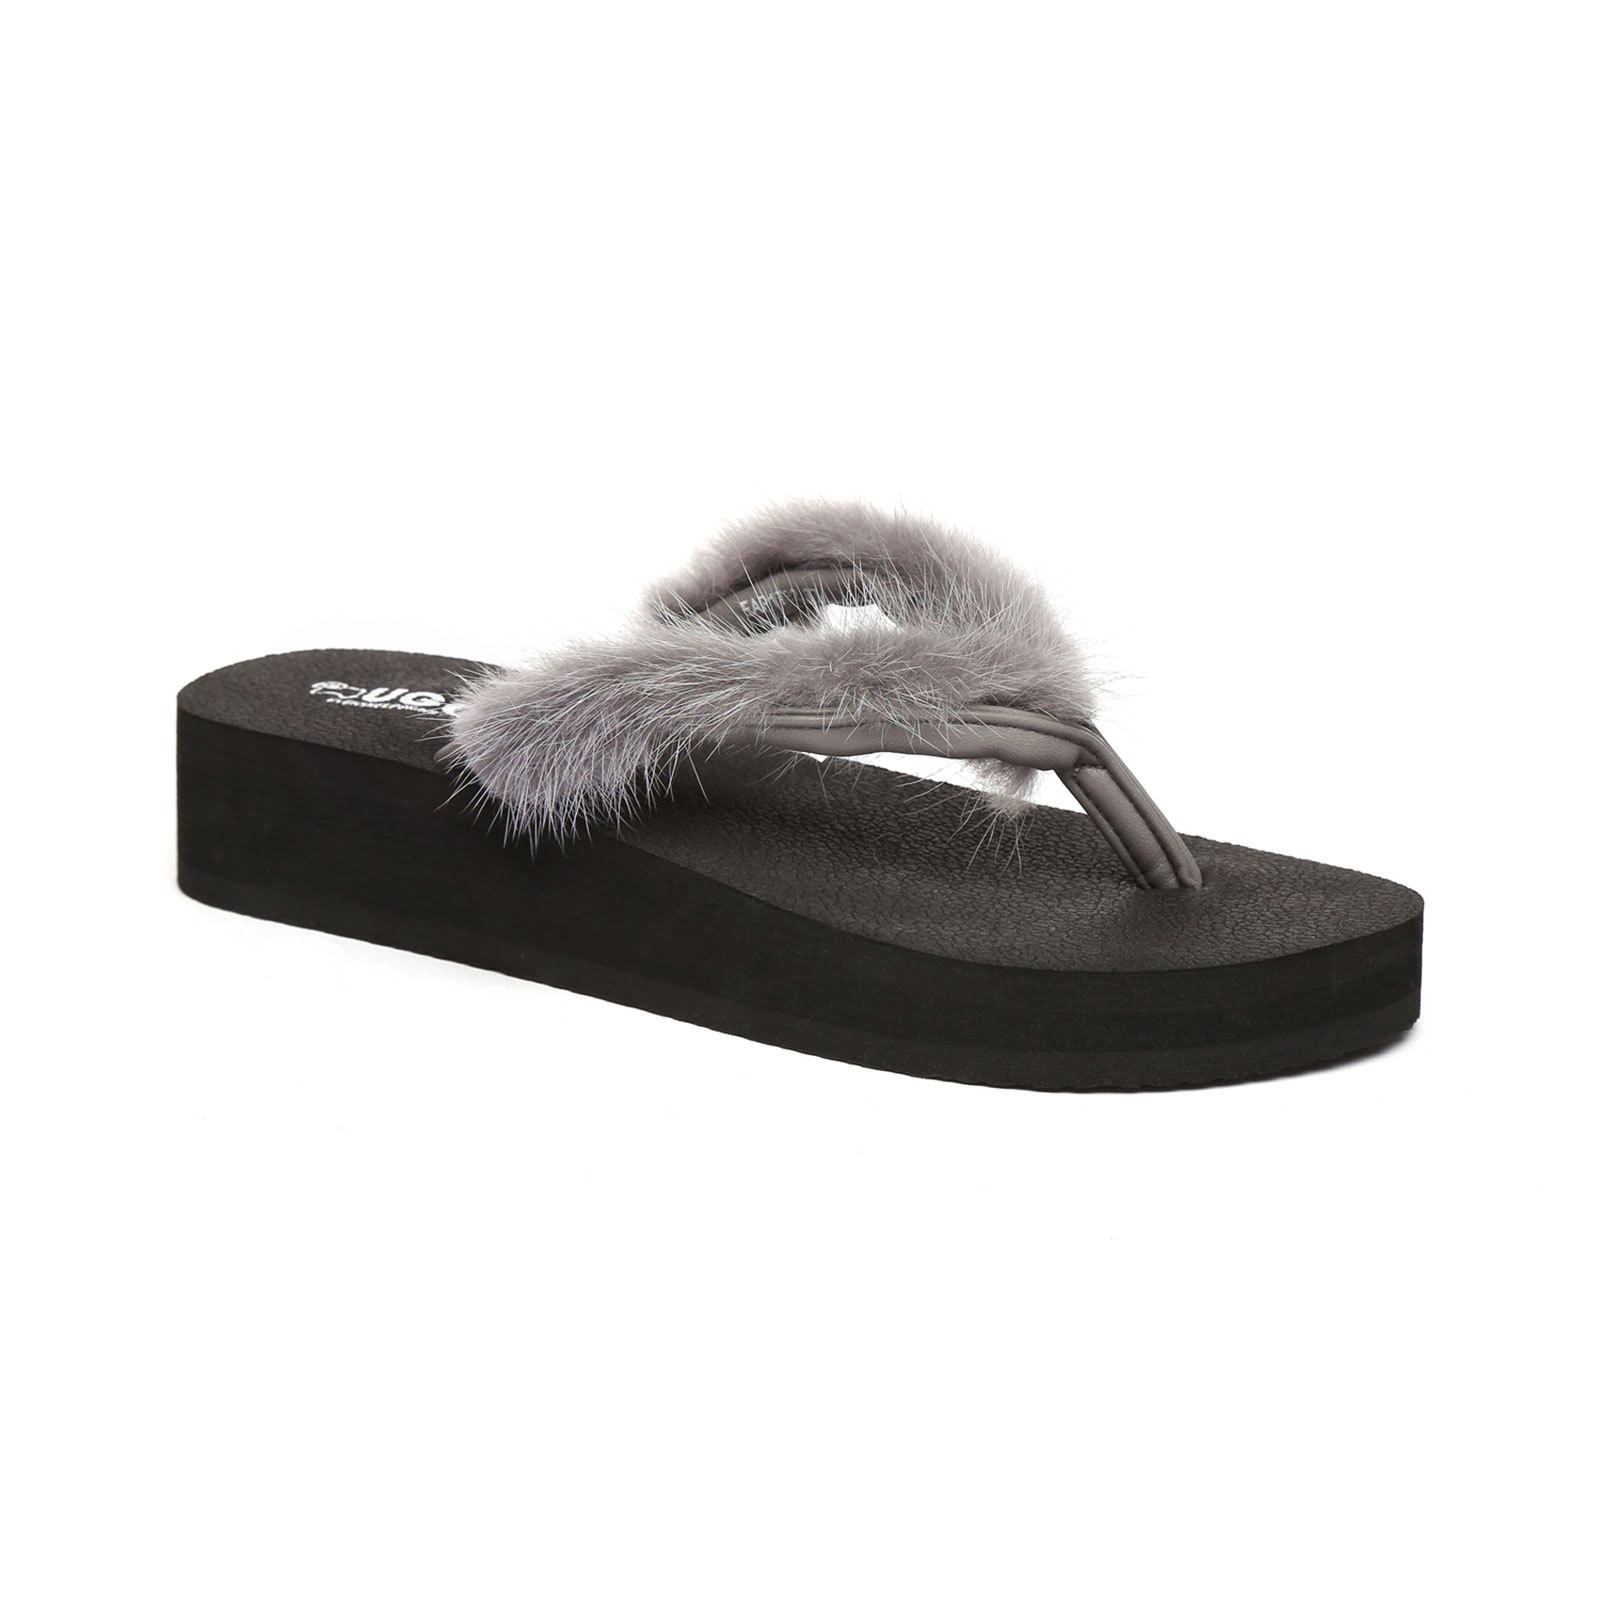 9a1ab254751e UGG Faye Women Comfort Fashion Wedge Platform Thongs Flip Flops ...